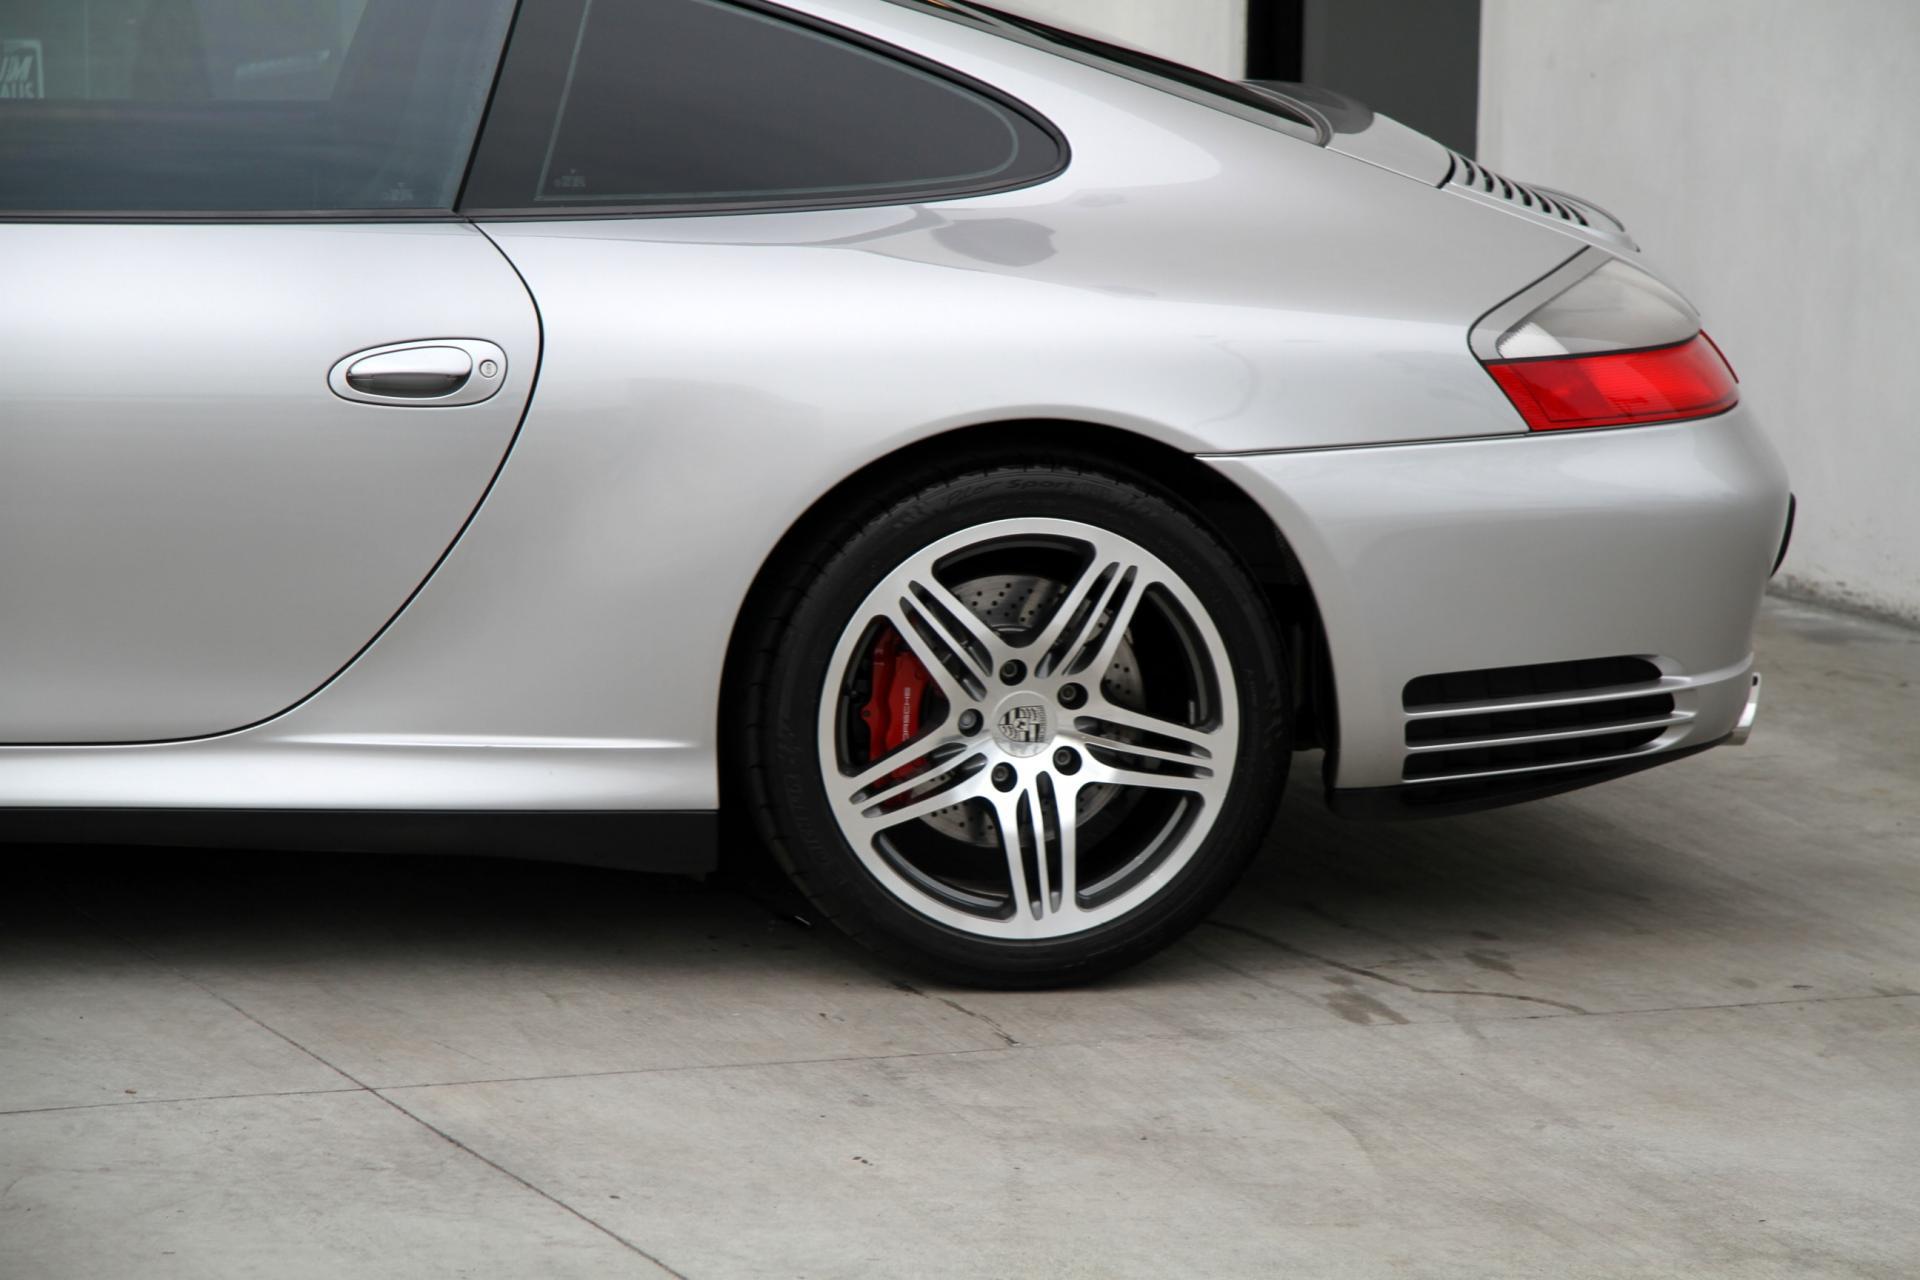 2002 Porsche 911 Carrera 4s 6 Speed Manual Stock